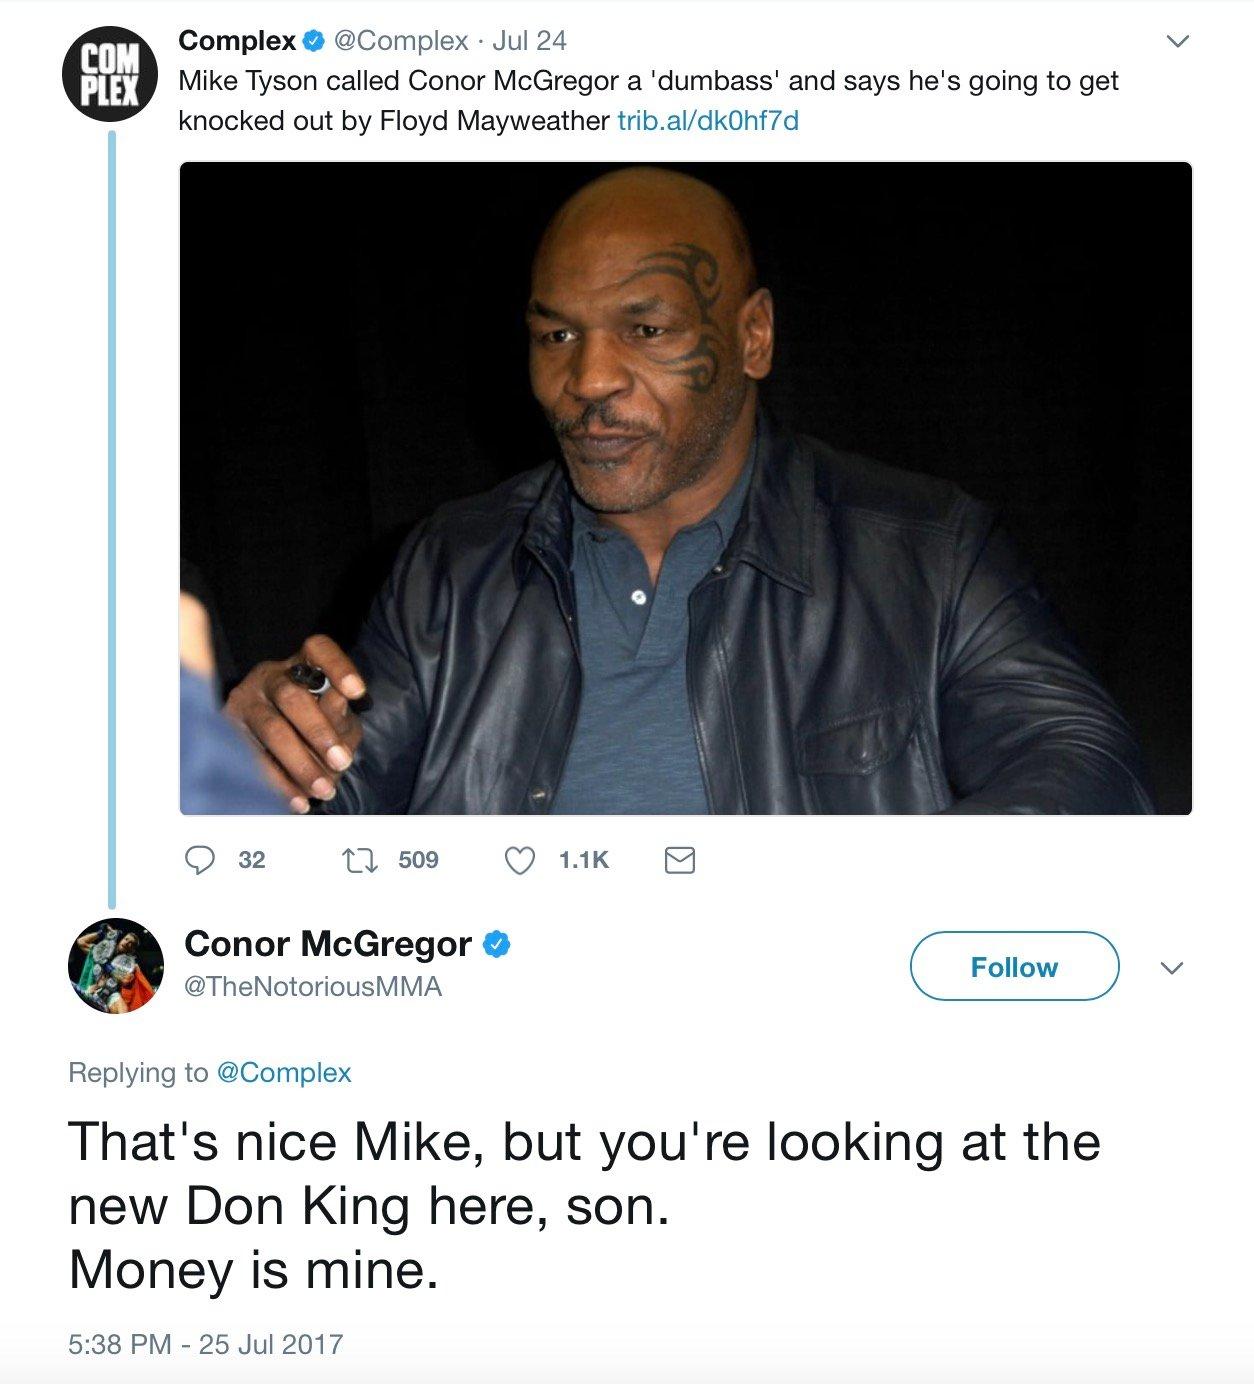 super popular 10117 f6d5c Conor McGregor Responds To Mike Tyson's KO Prediction: